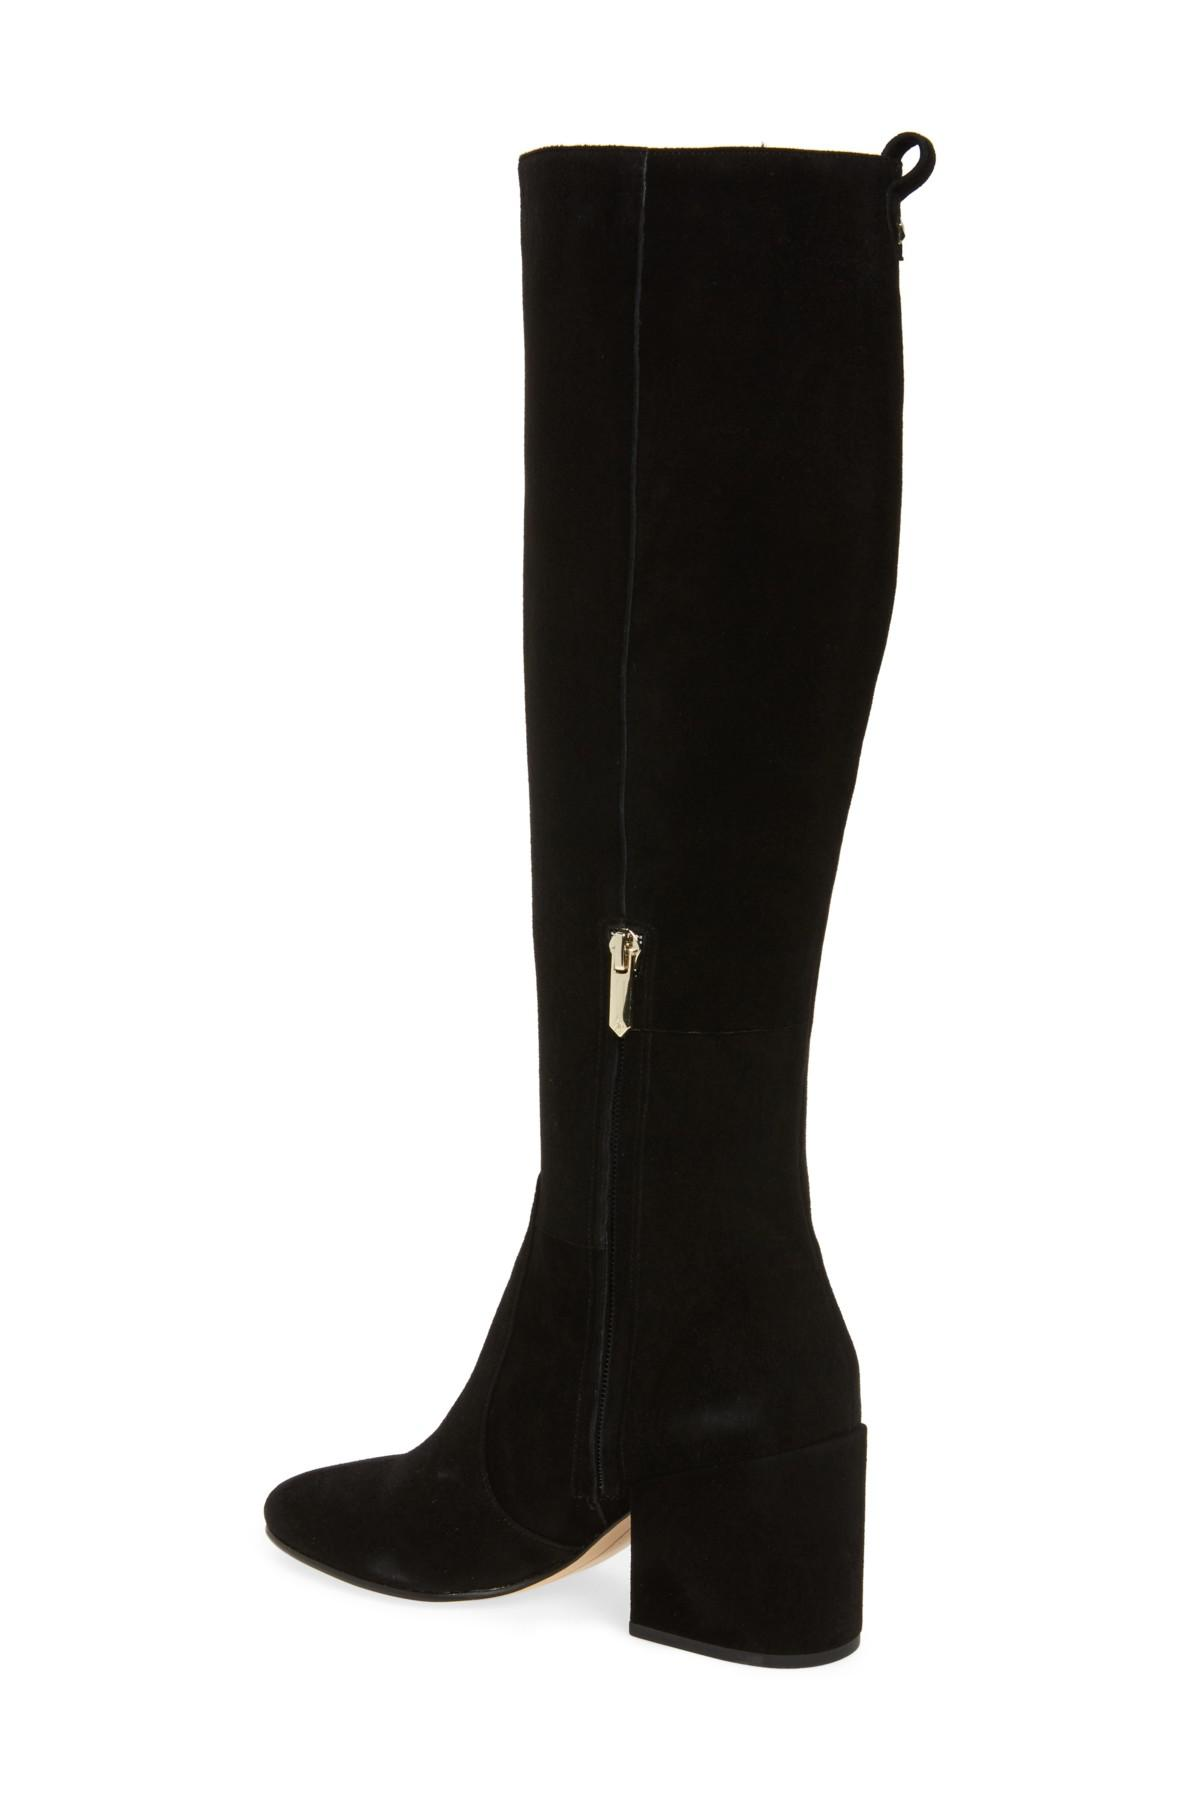 99031e5a65c8 Lyst - Sam Edelman Thora Knee High Boot (women) in Black